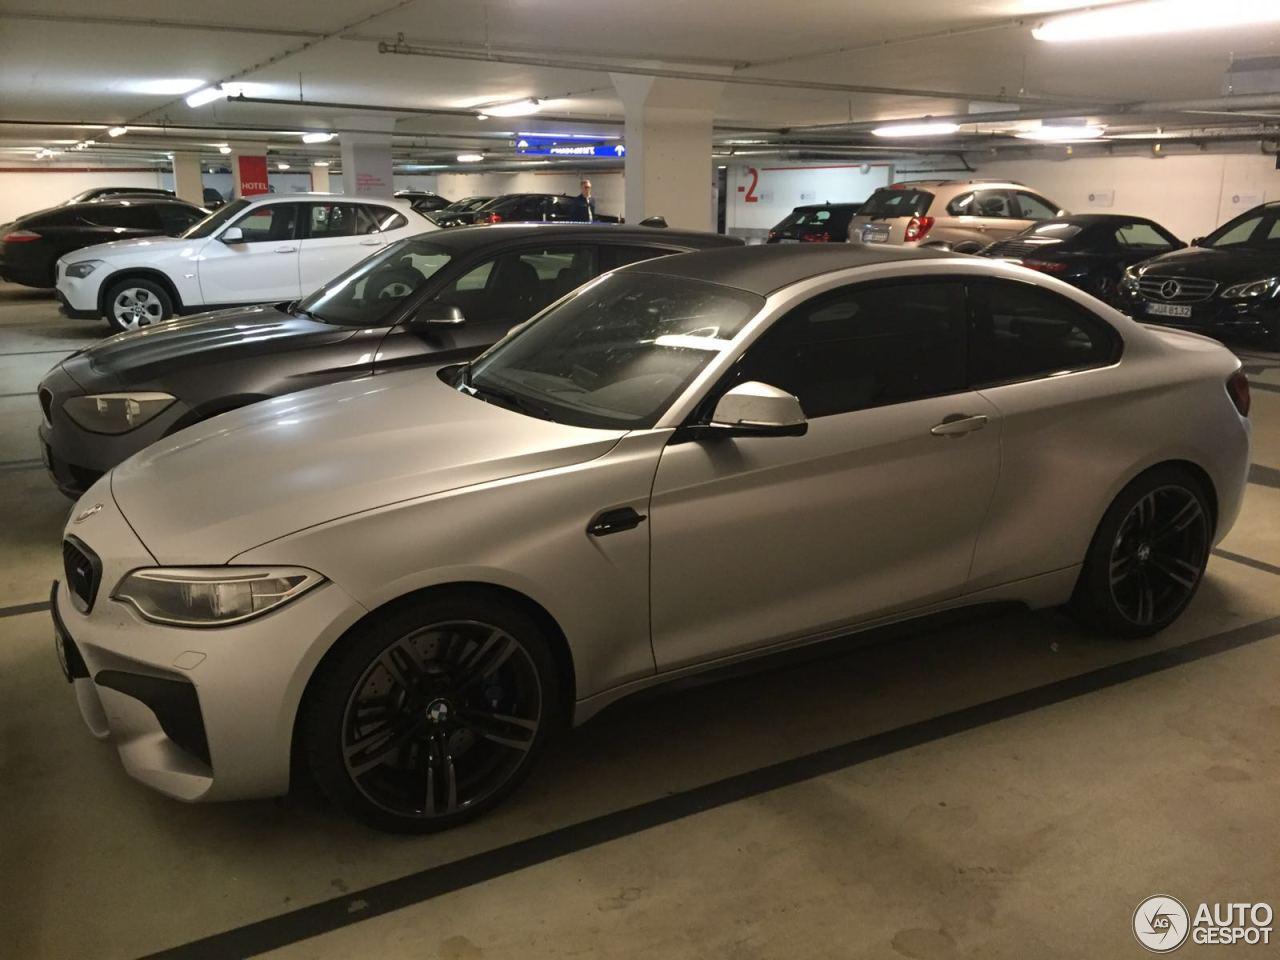 BMW M2 Coupé F87 - 31 May 2016 - Autogespot